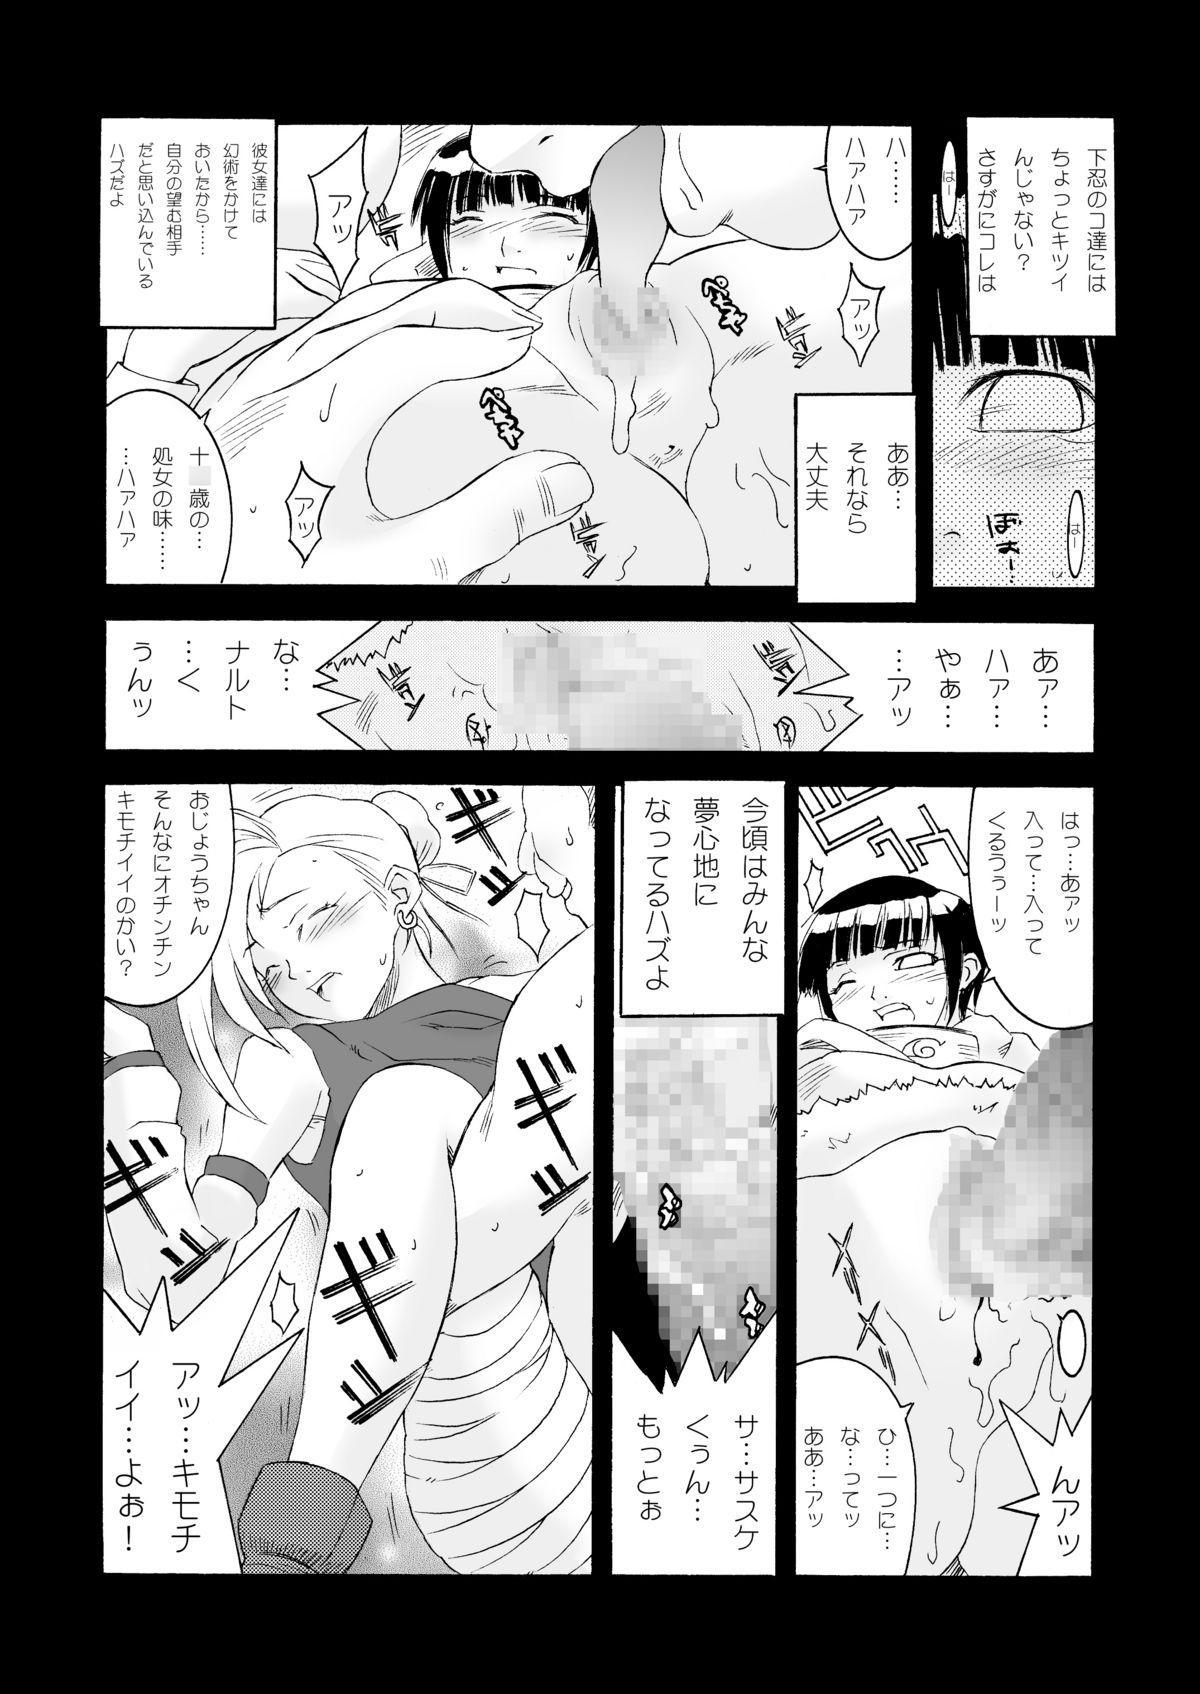 [MG WORKS (Isou Doubaku) Q.N.T DL (Naruto) [Digital] 19